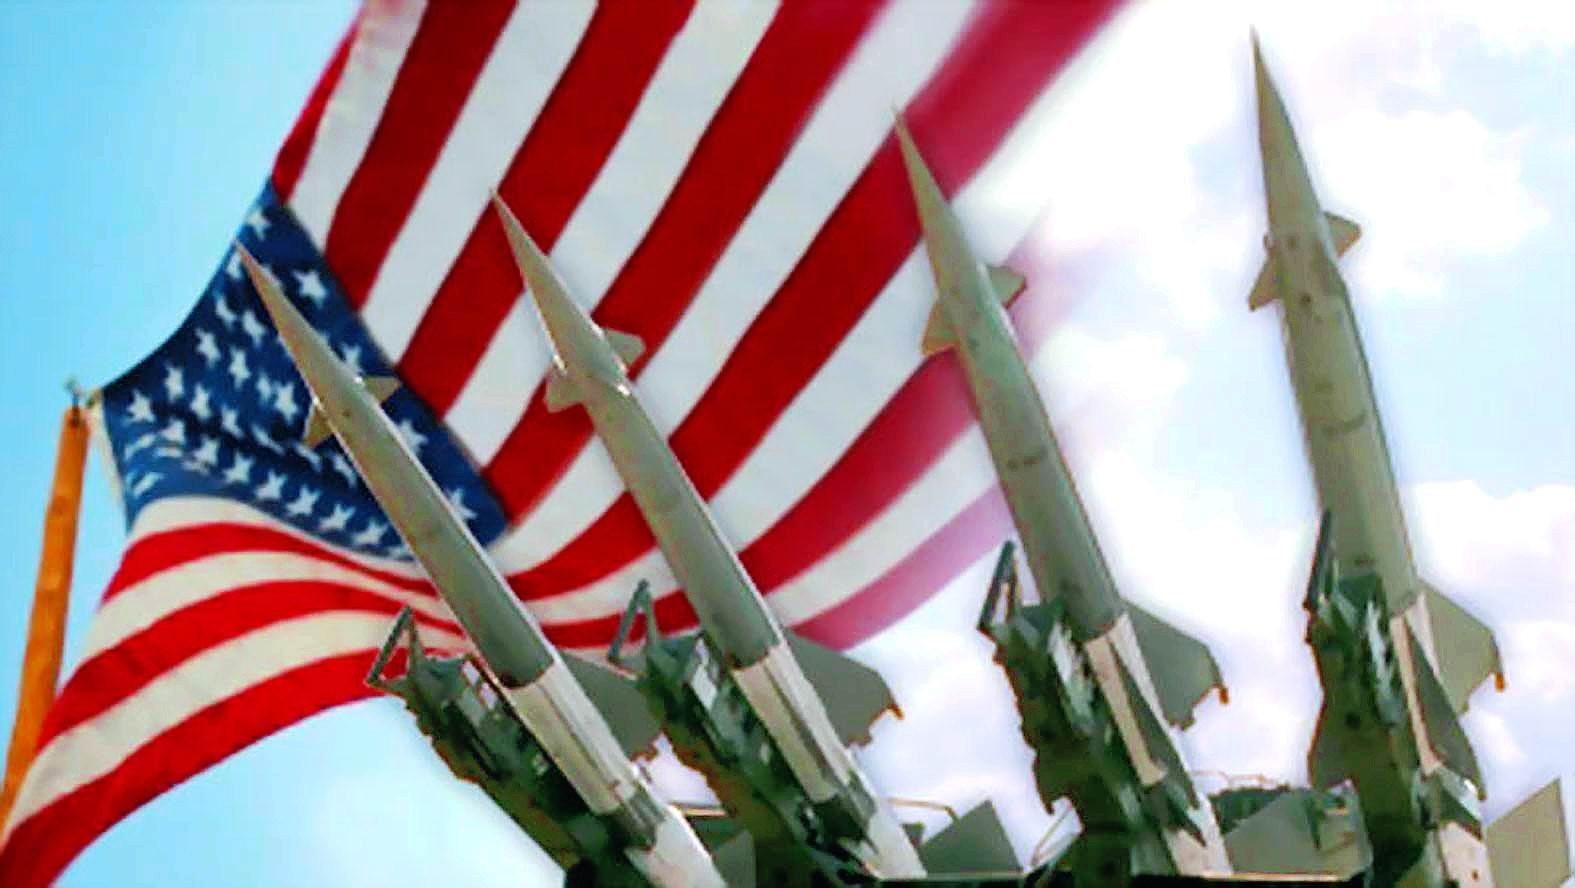 Ракеты на фоне американского флага